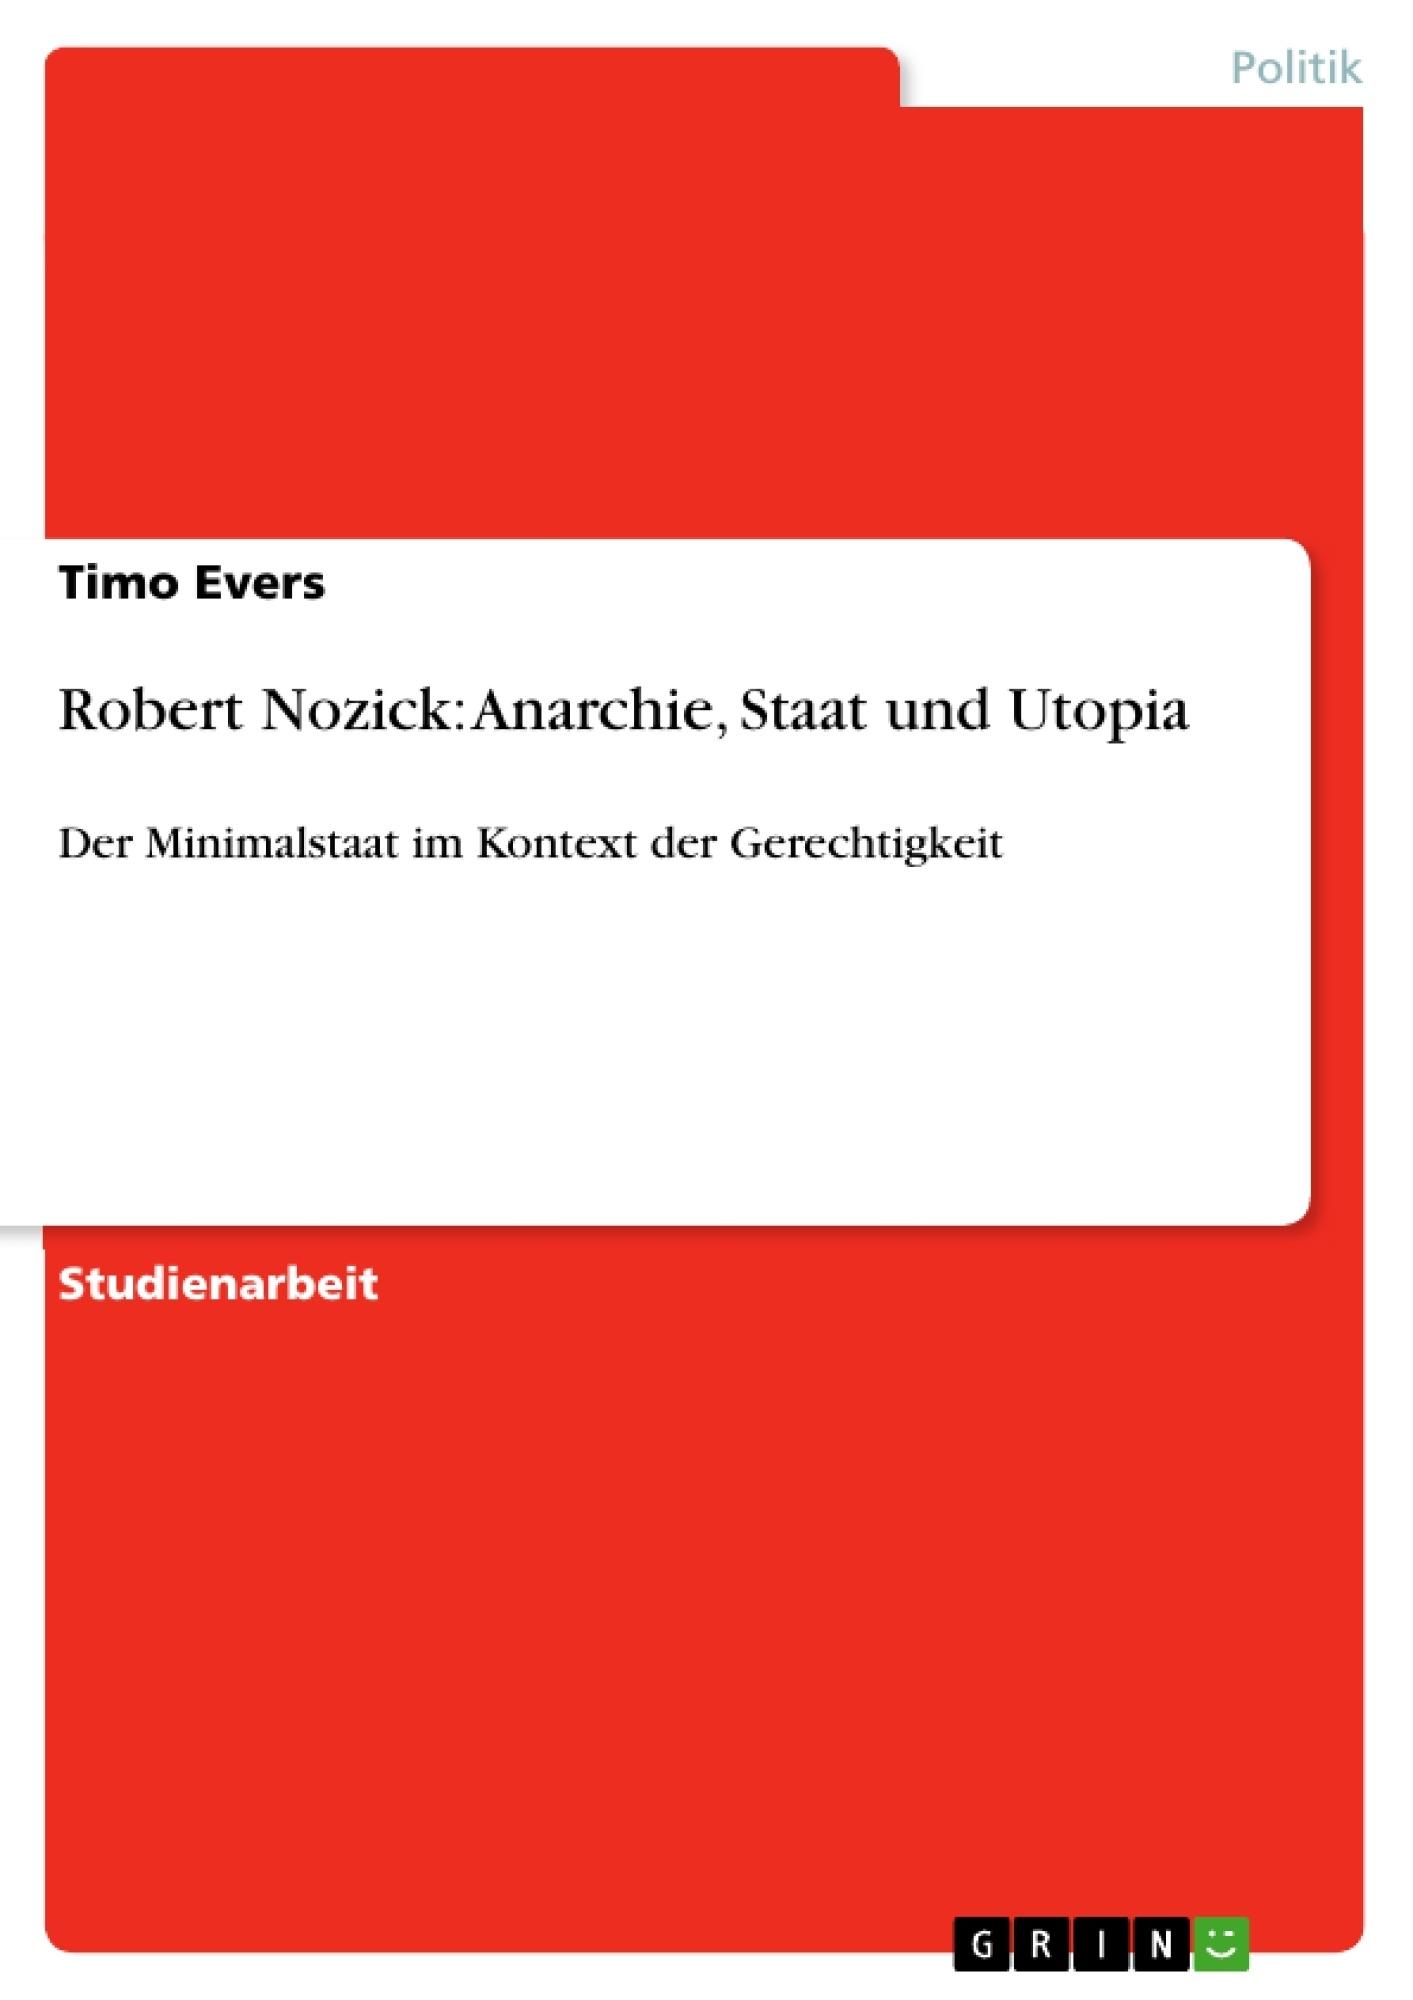 Titel: Robert Nozick: Anarchie, Staat und Utopia